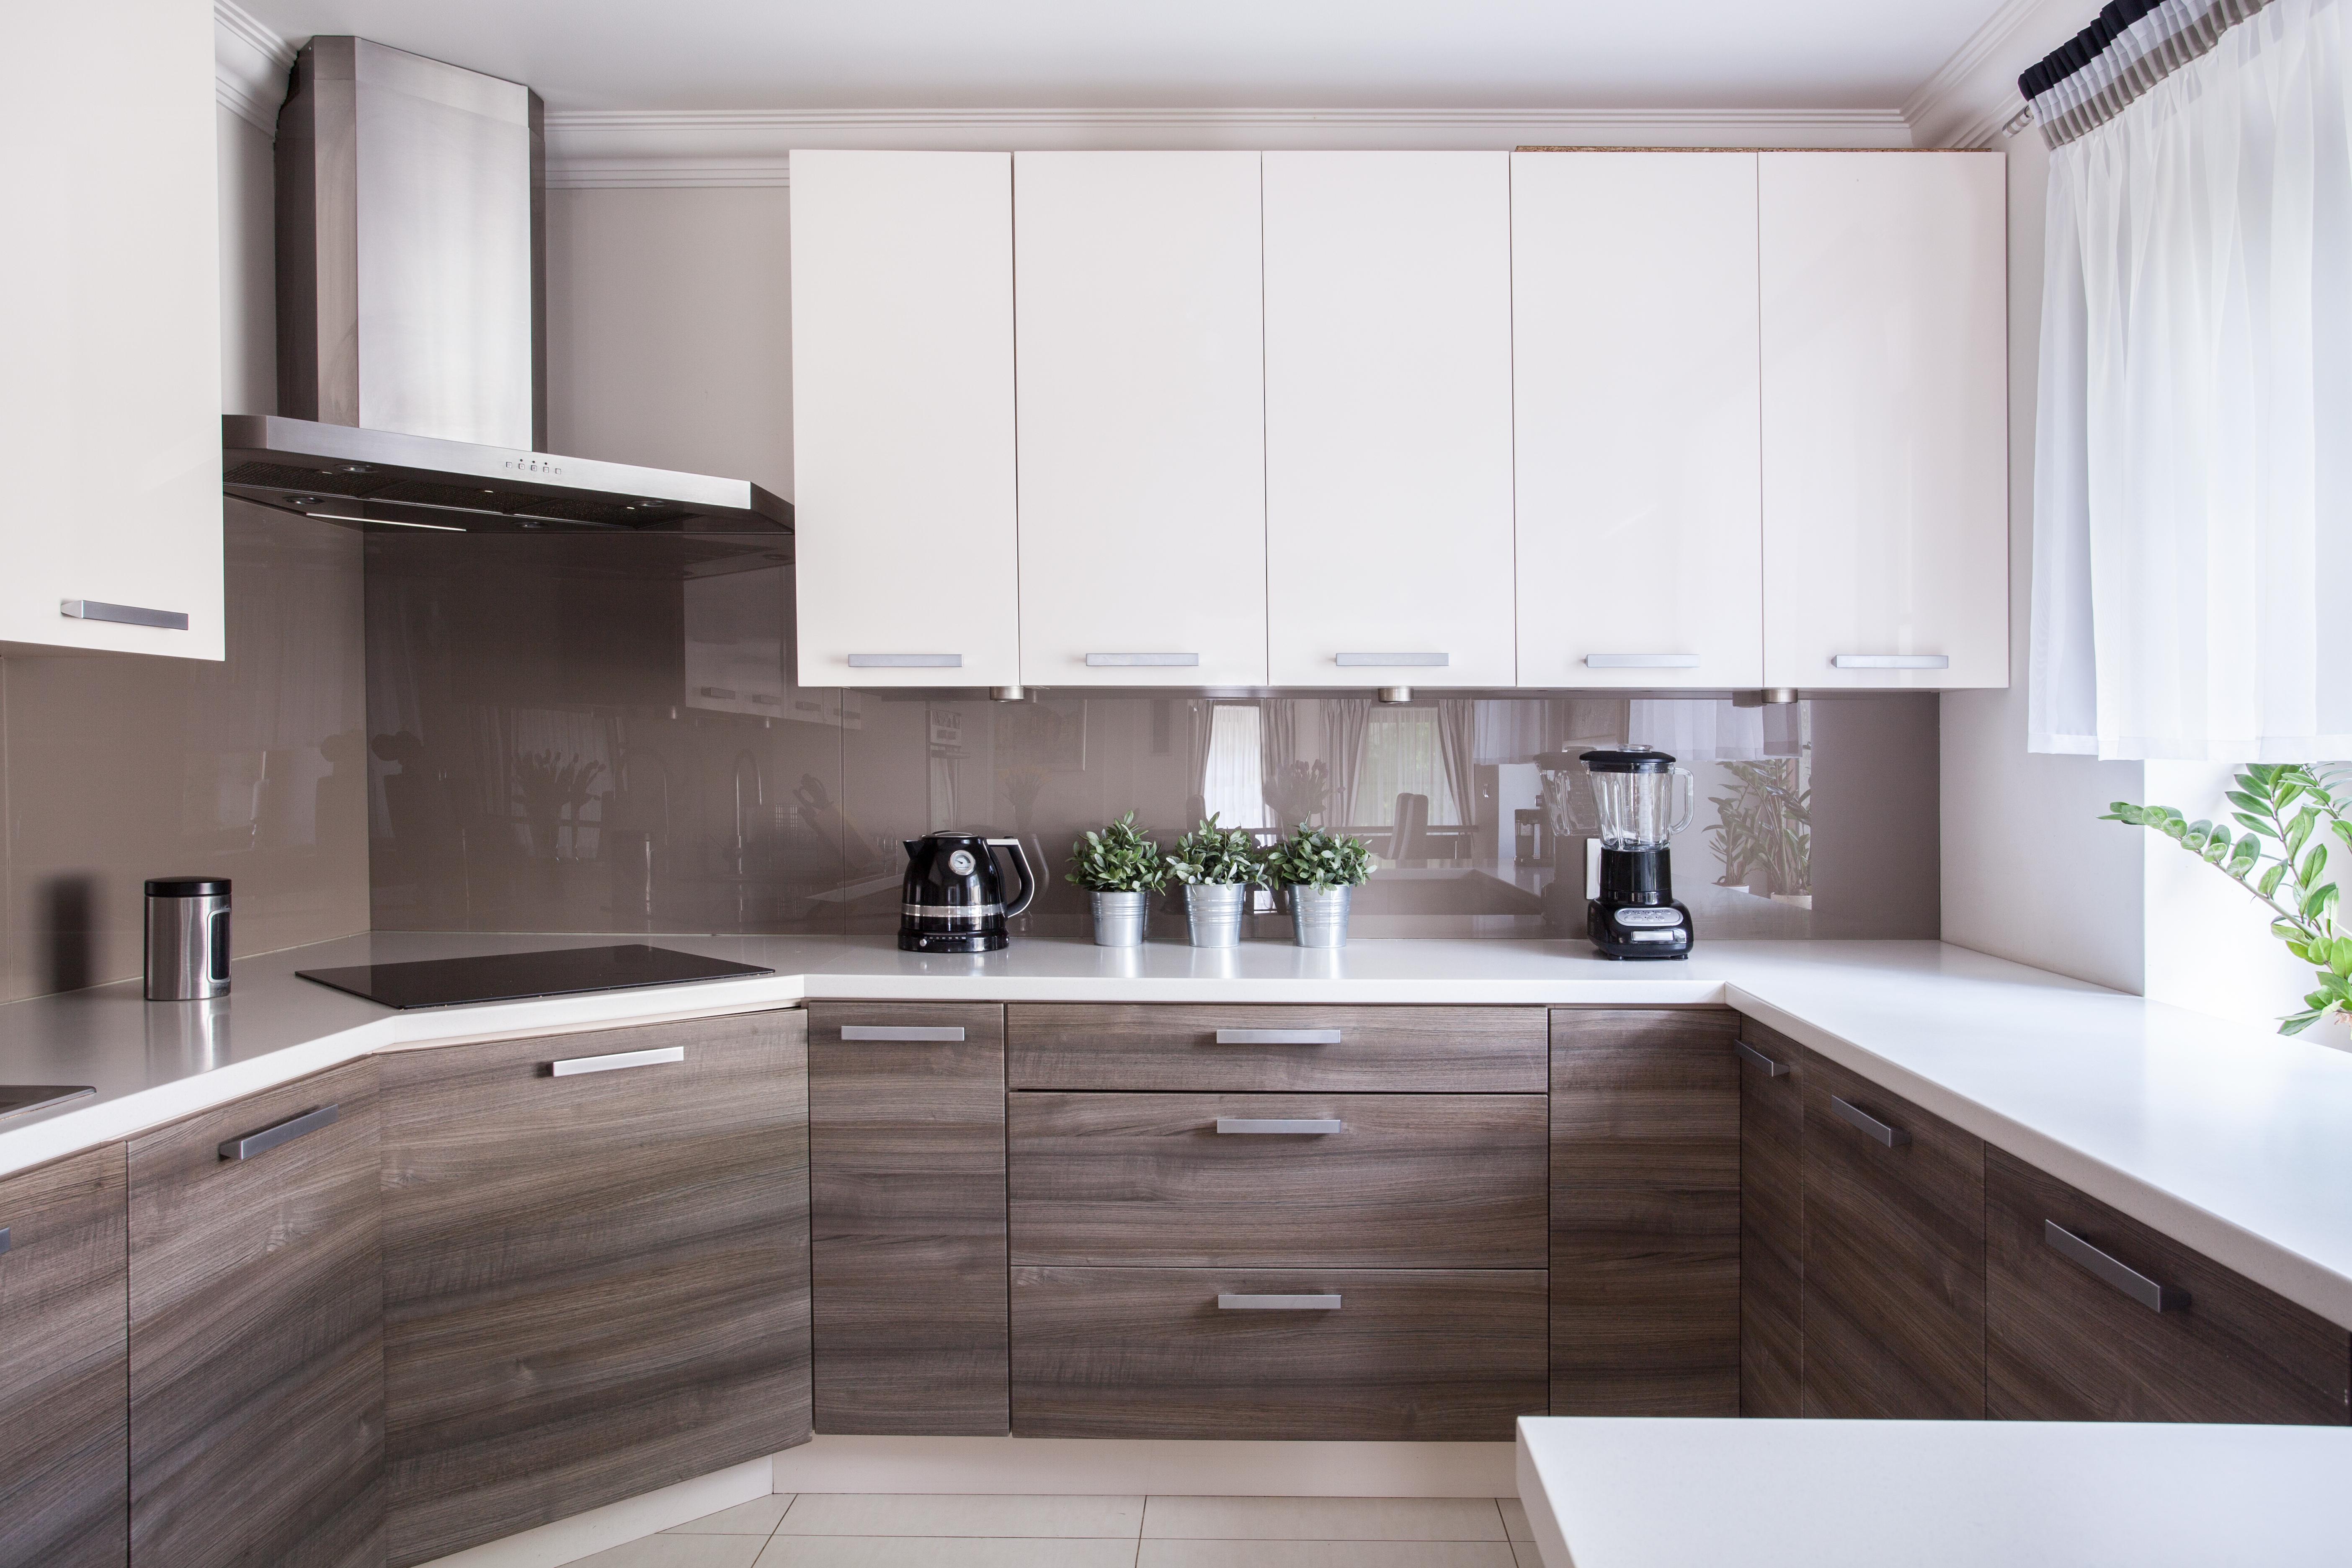 oak and ivory kitchen design